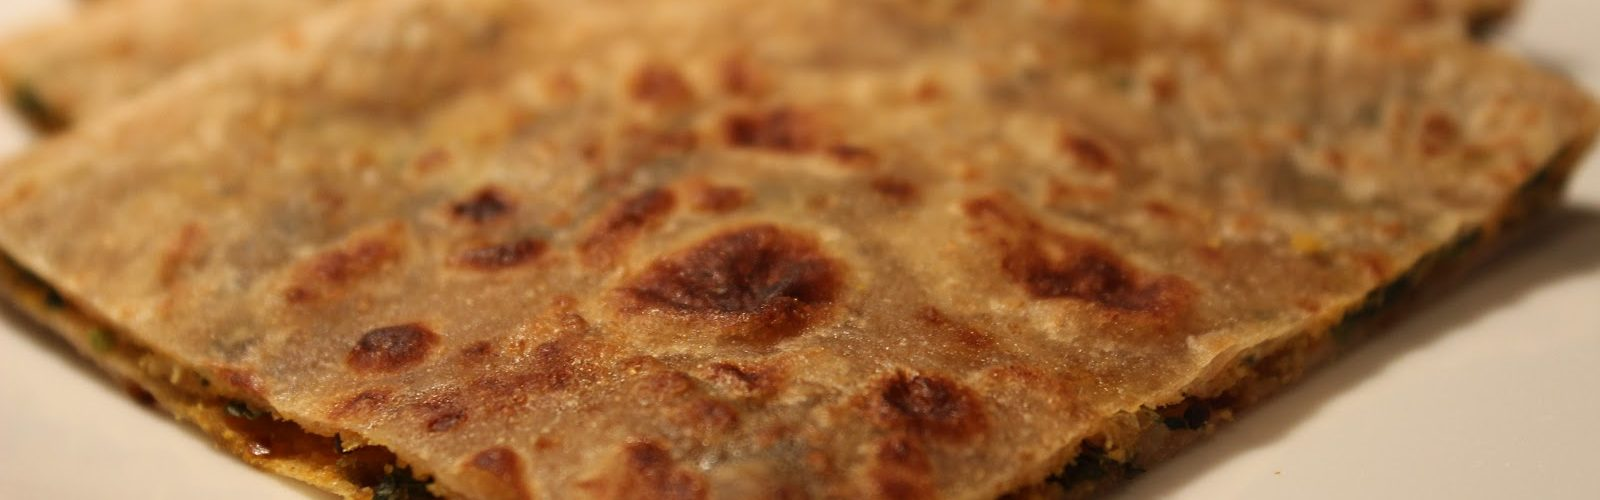 Bharwa Methi Paratha (Anti-Diabetic) Recipe – How To Make Bharwa Methi Paratha